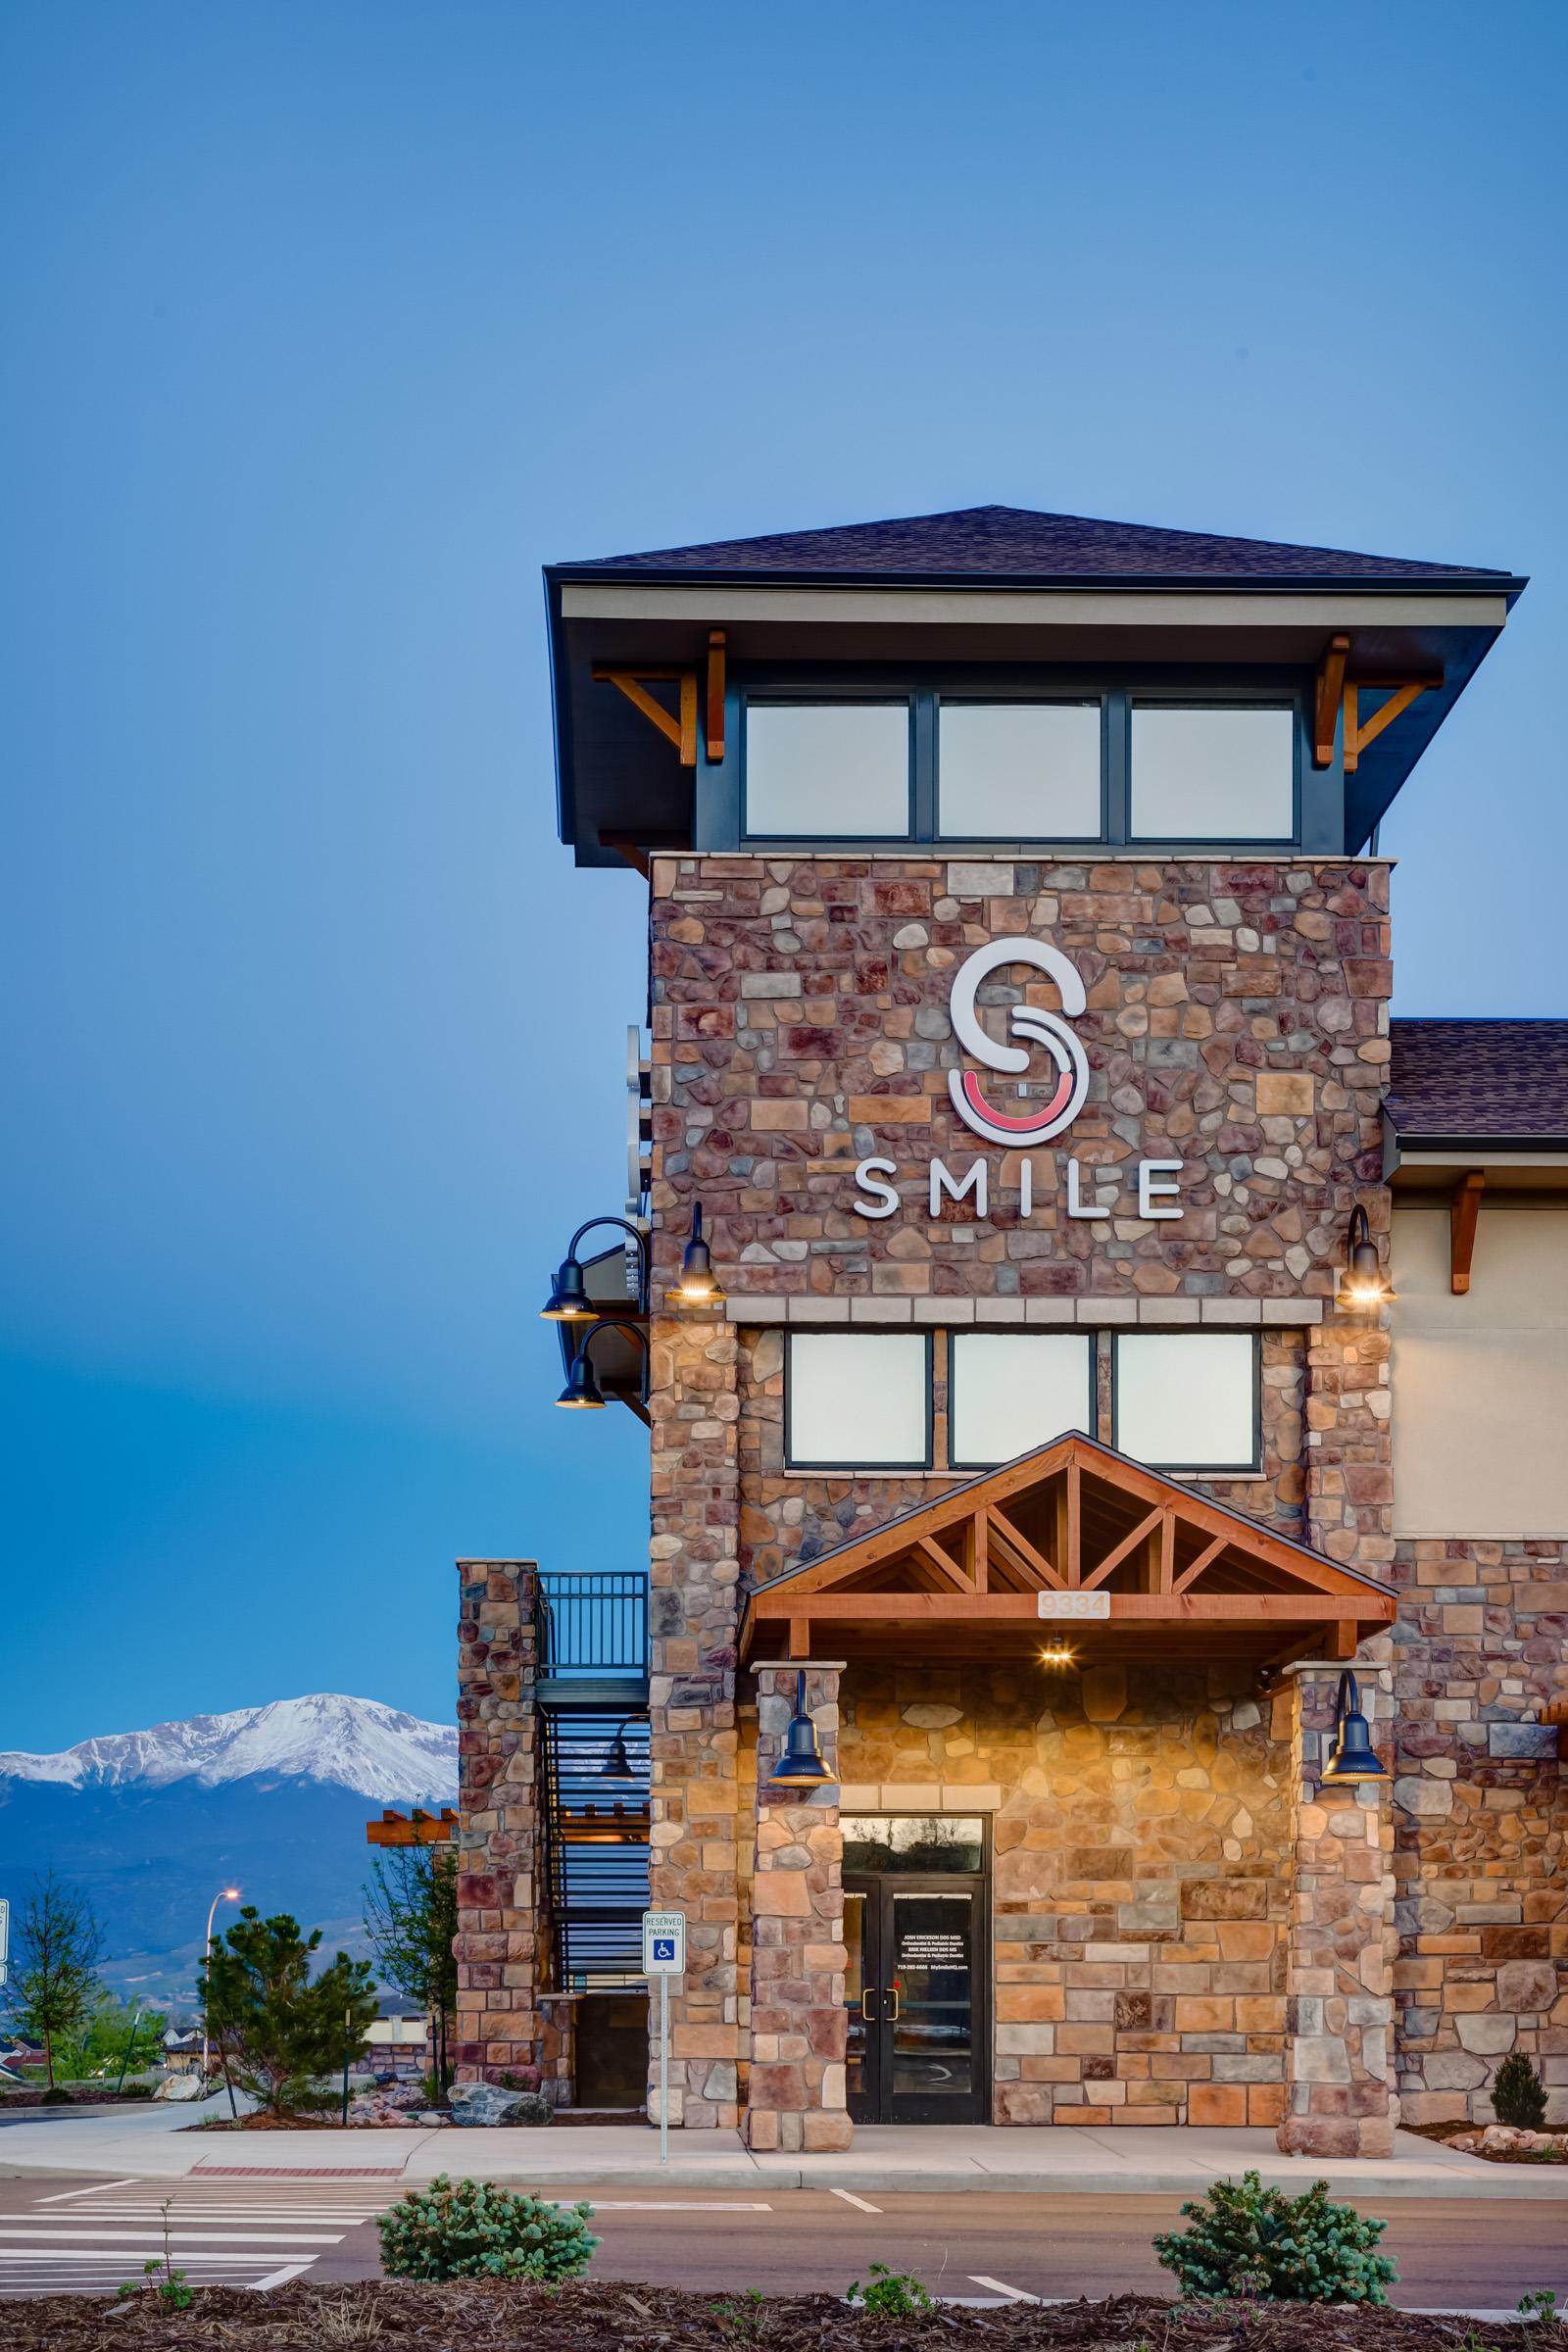 Smile-Orthodontics-Pediatric-Dentistry-0006-WEB.jpg